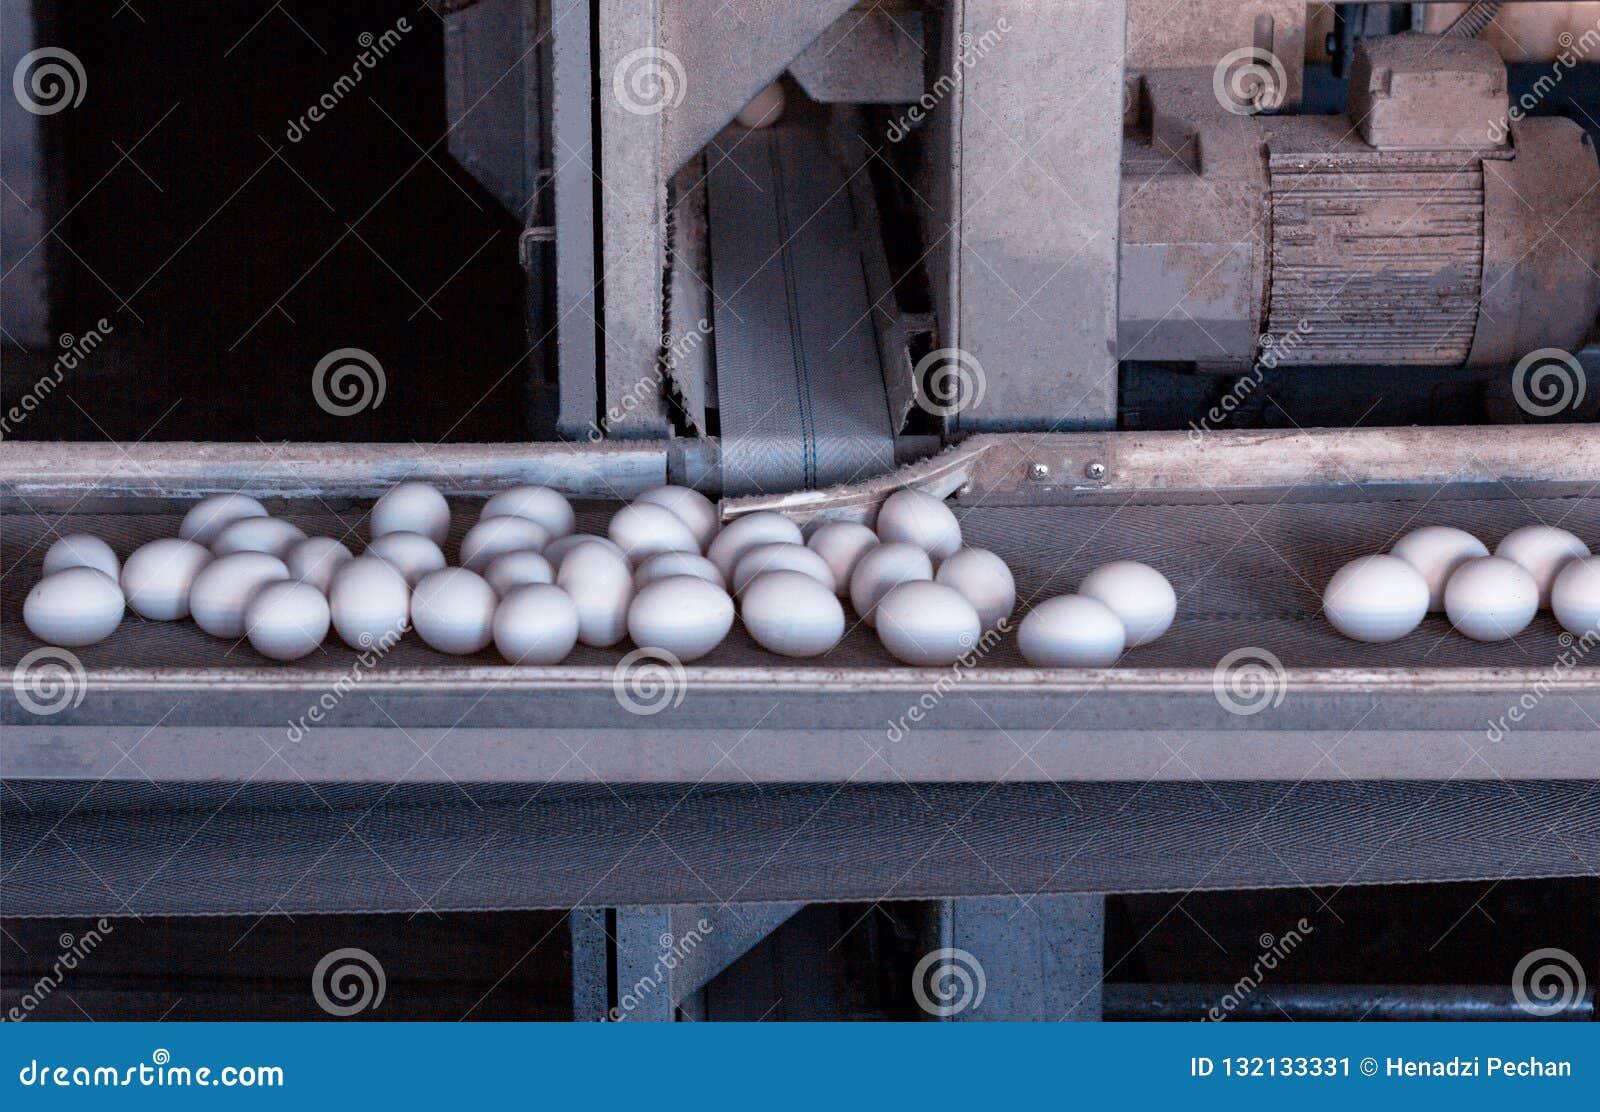 Транспортер для яйца цена зерна на элеваторах